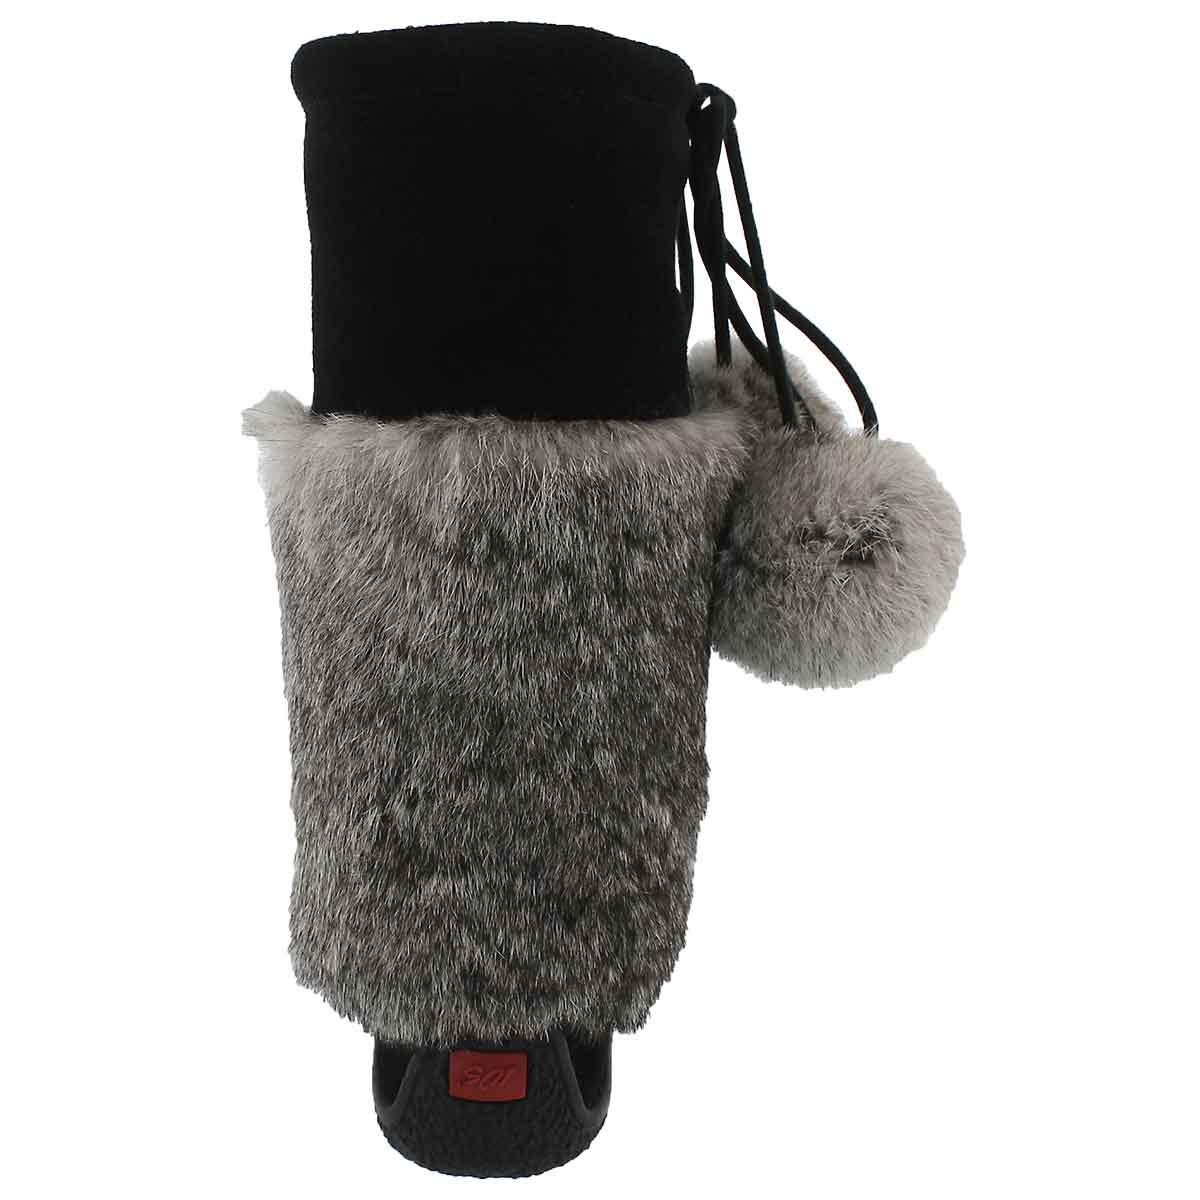 Lds Niska 3 blk/gry rabbit collar mukluk